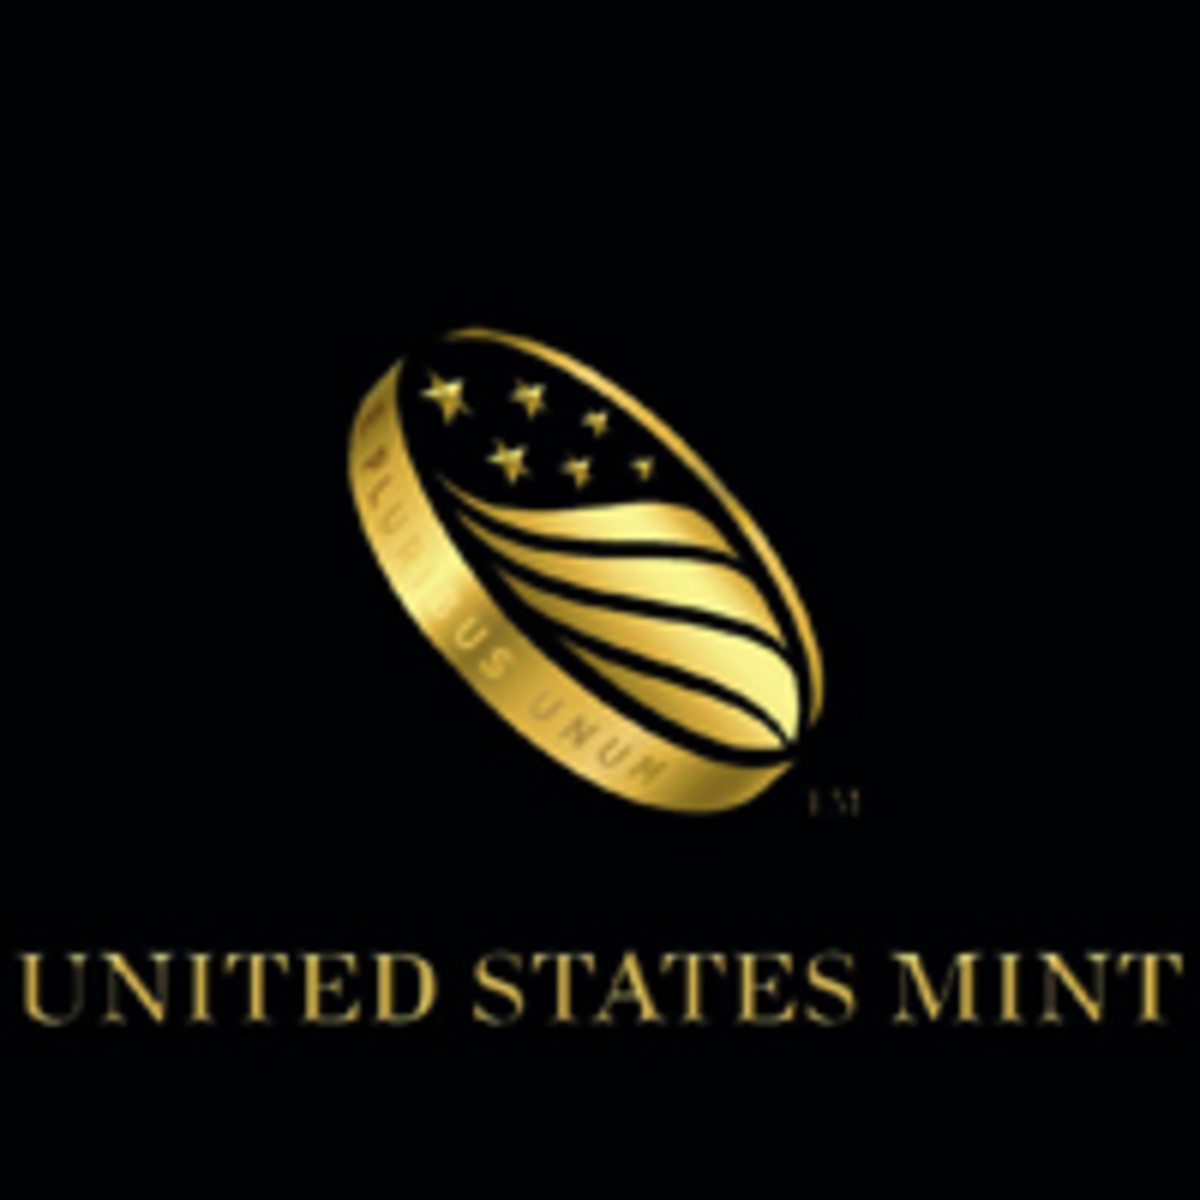 MintMailOrders0620